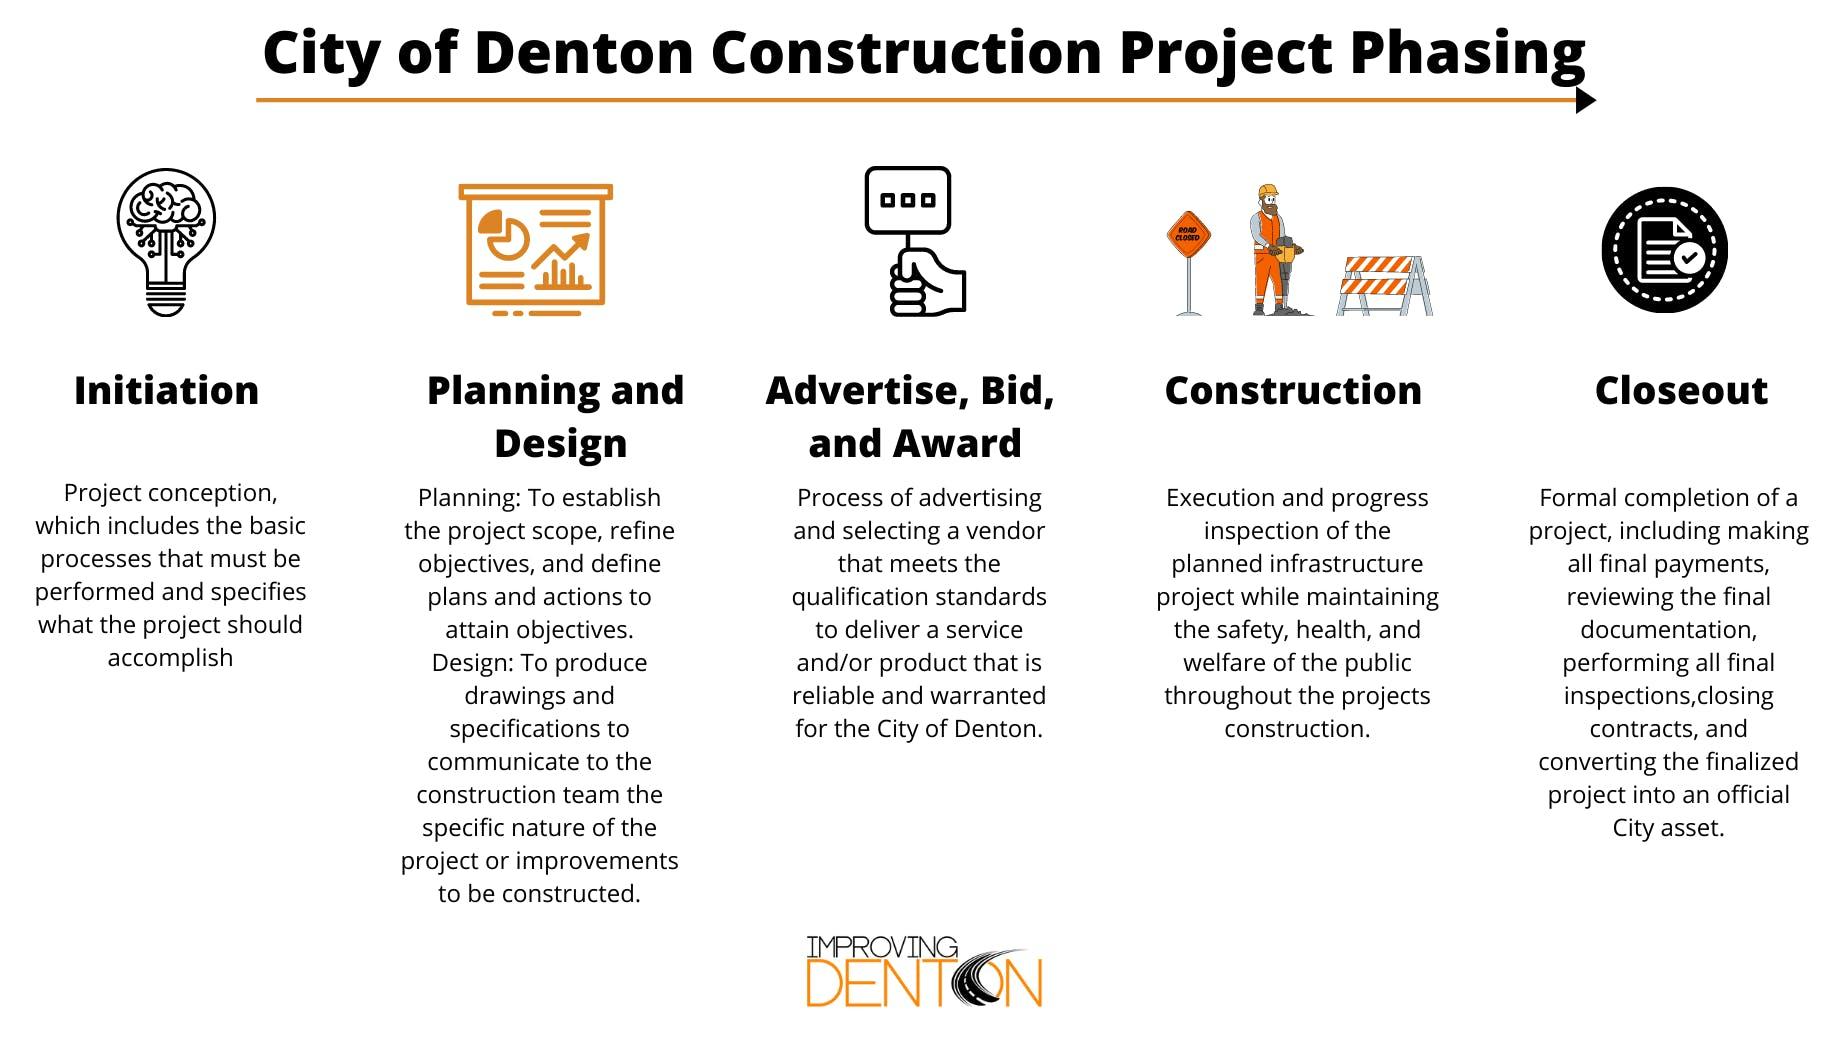 City of Denton Construction Project Phasing